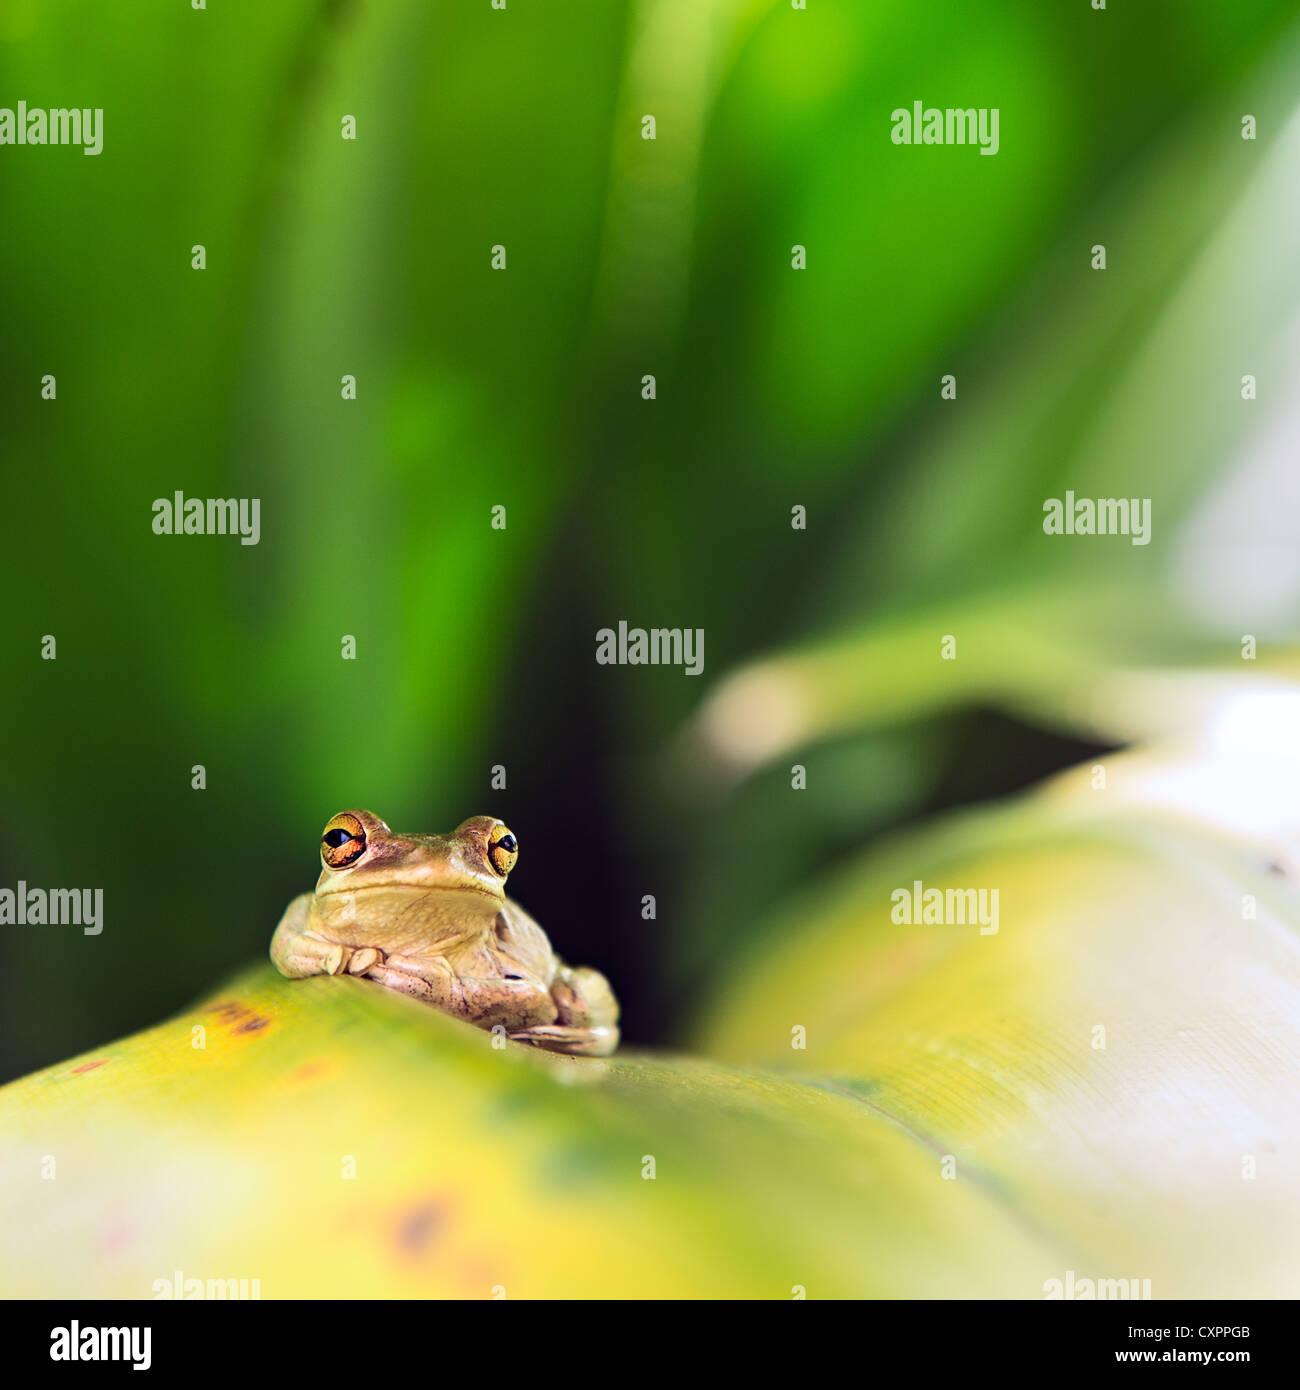 Cuban Tree Frog (Osteopilus Septentrionalis) on a leaf - Stock Image